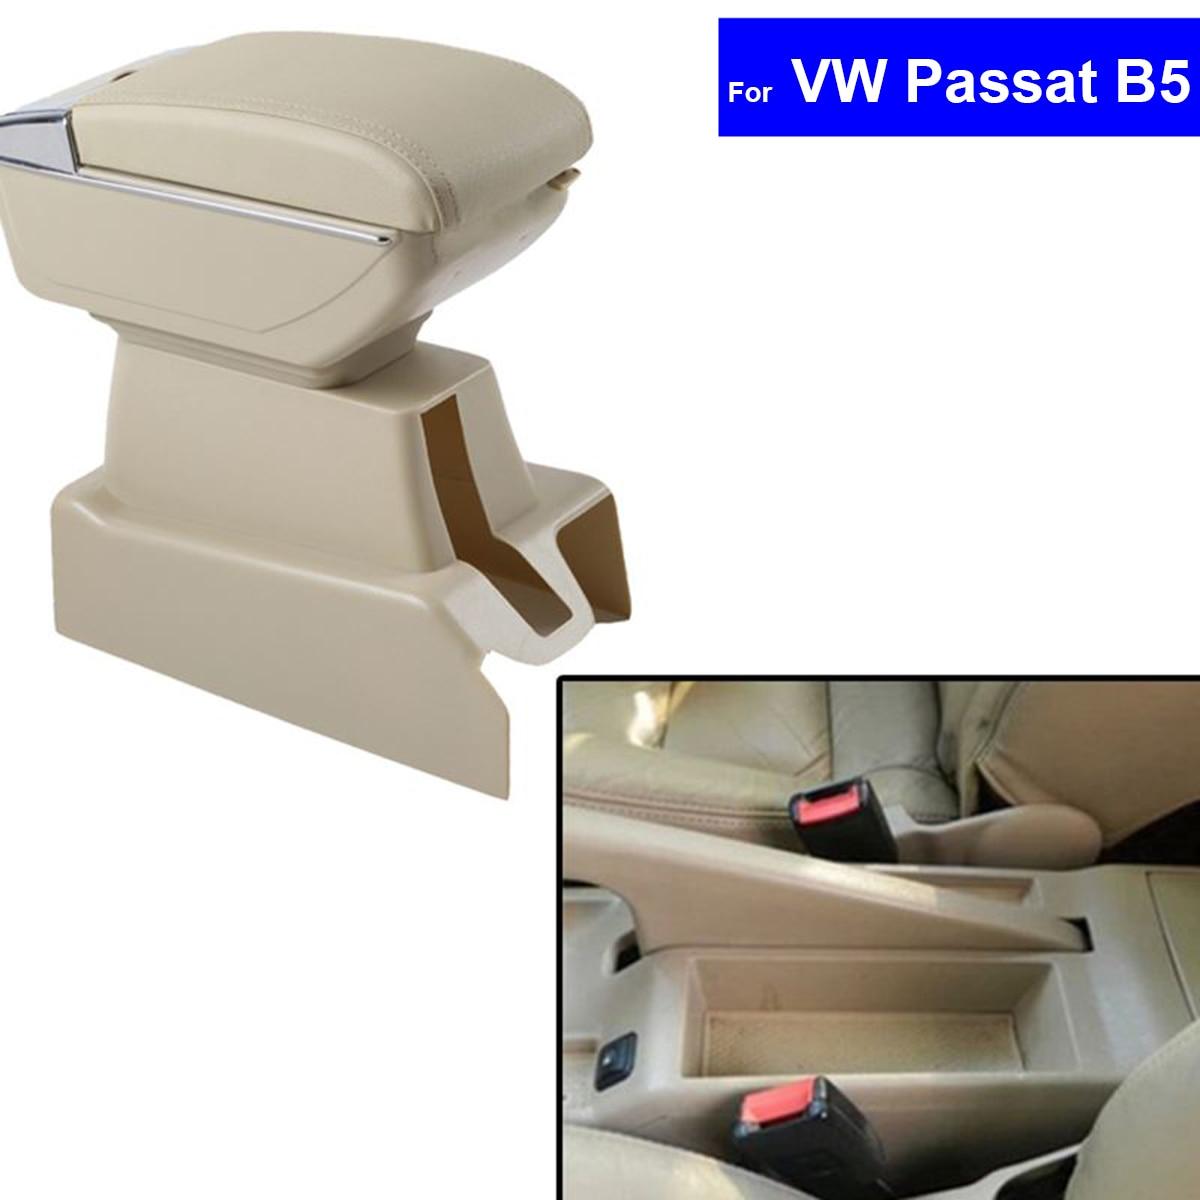 цены Leather Car Center Console Armrest Storage Box for Volkswagen VW Passat B5 2002 ~2005 2006 2007 2008 2009 Armrests Free Shipping